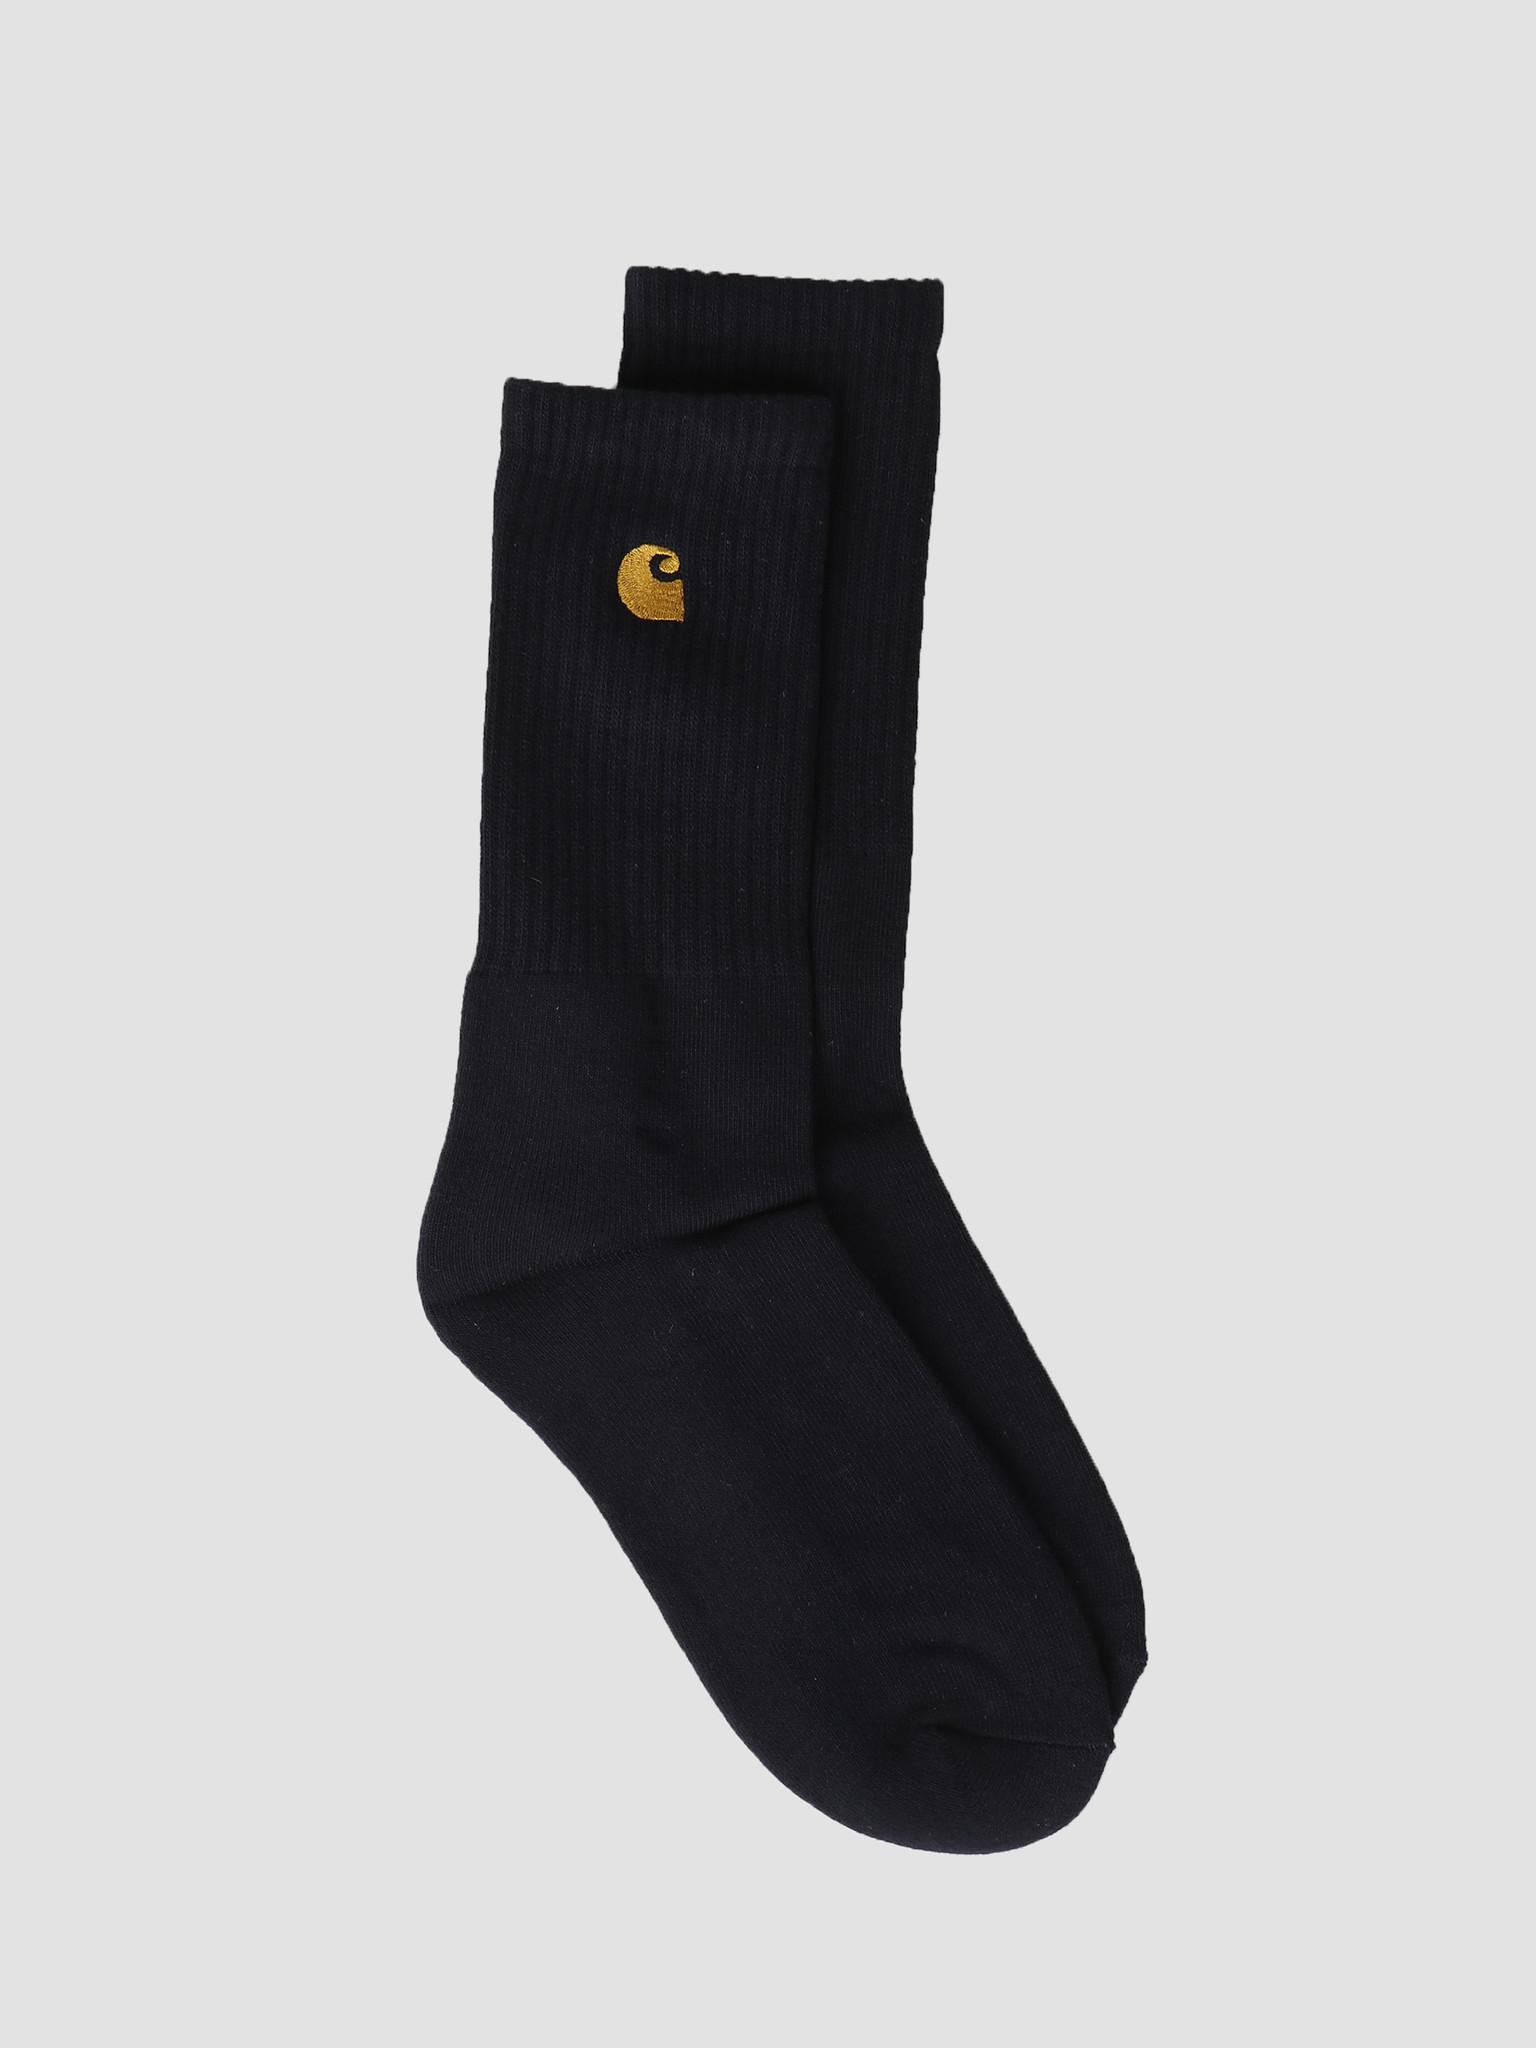 Carhartt WIP Carhartt WIP Chase Socks Dark Navy Gold I026527